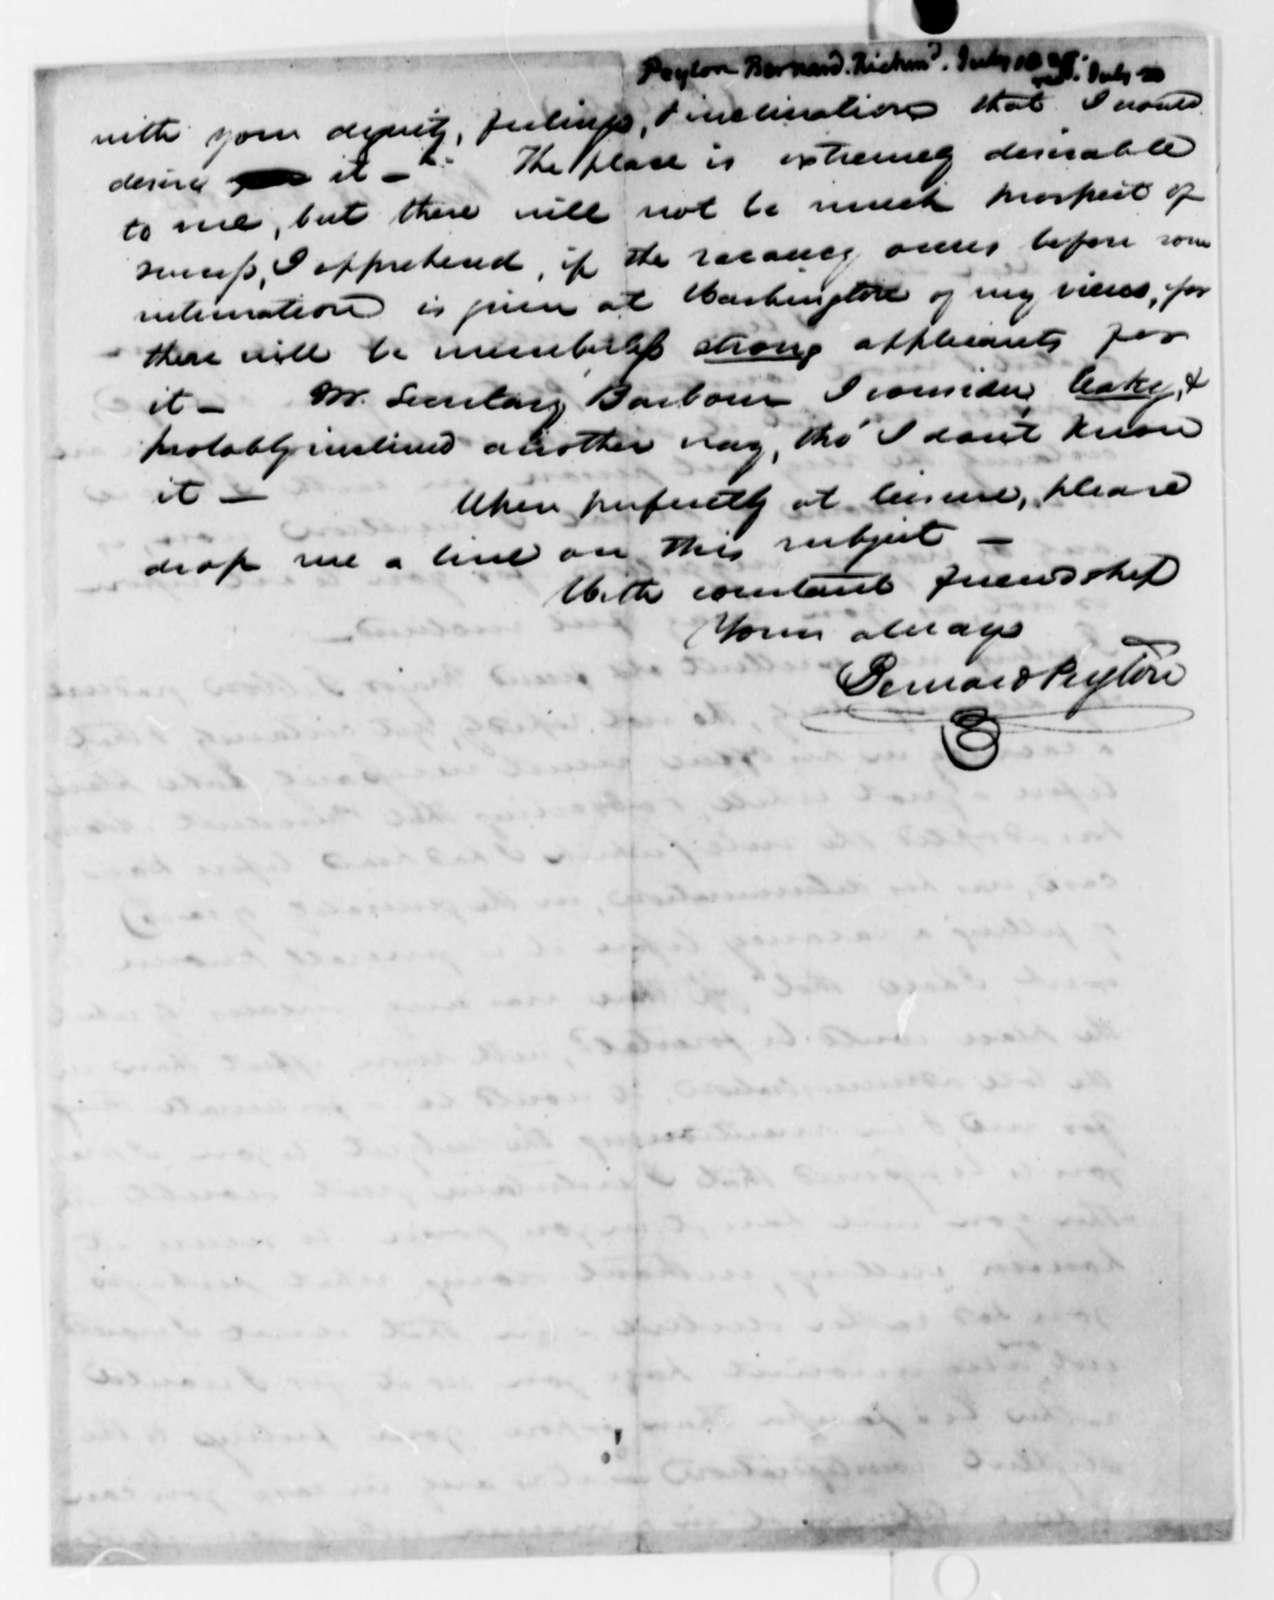 Bernard Peyton to Thomas Jefferson, July 18, 1825